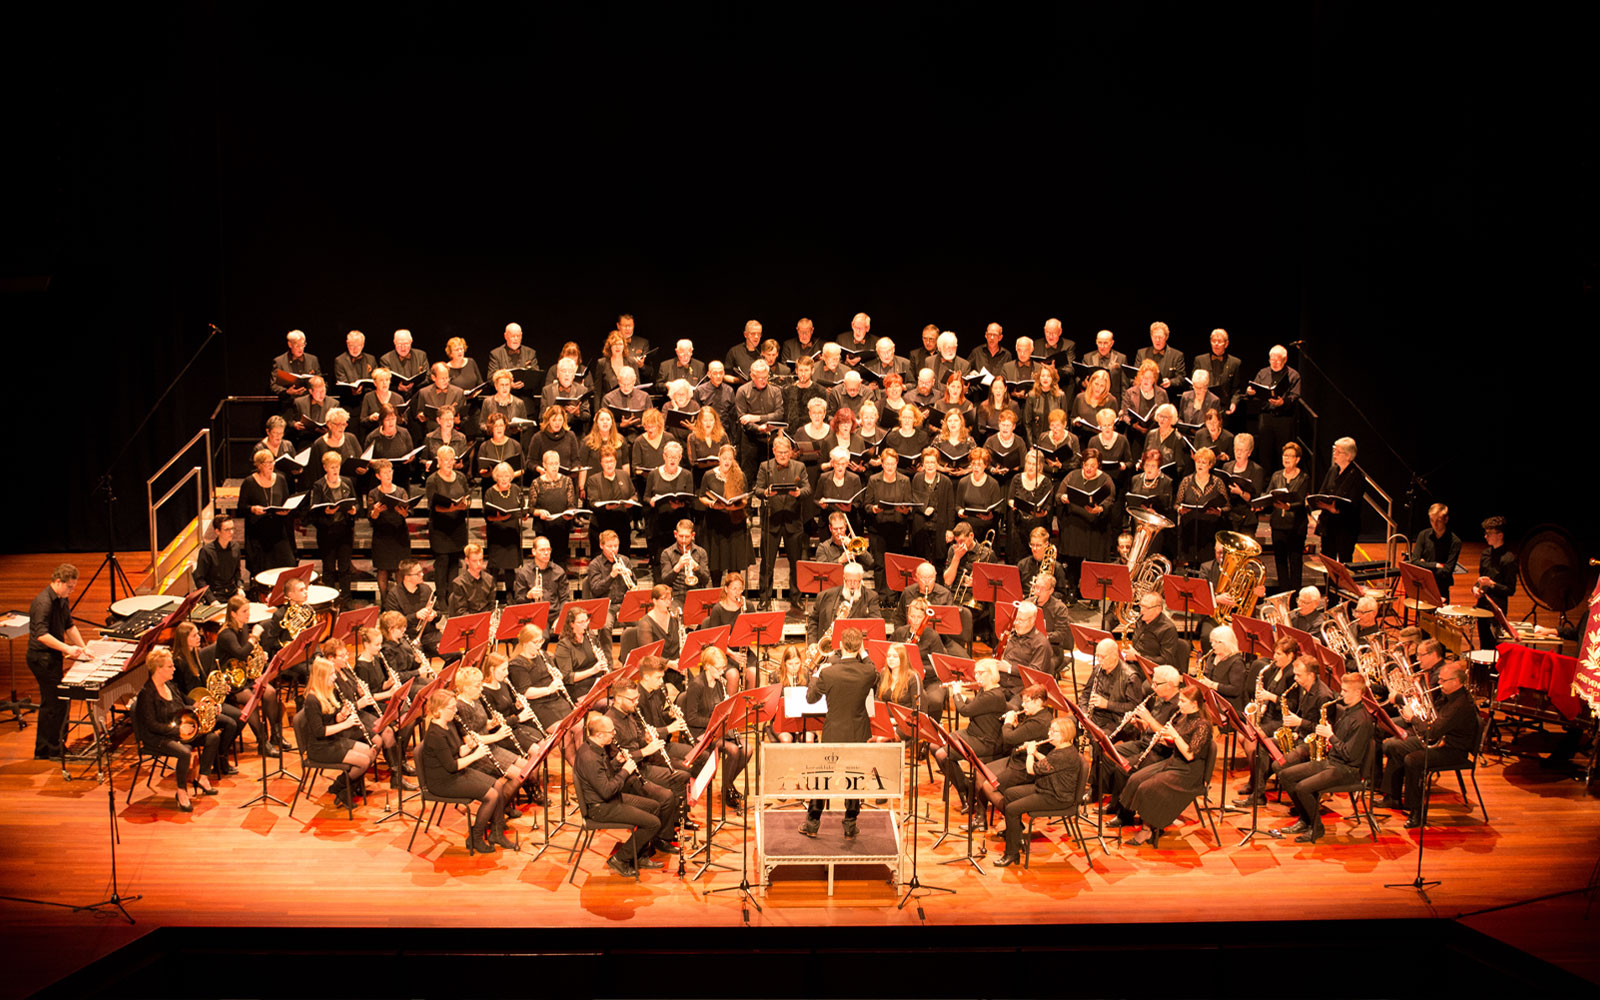 Jubileumconcert van Koninklijke Harmonie Aurora Grevenbicht Papenhoven